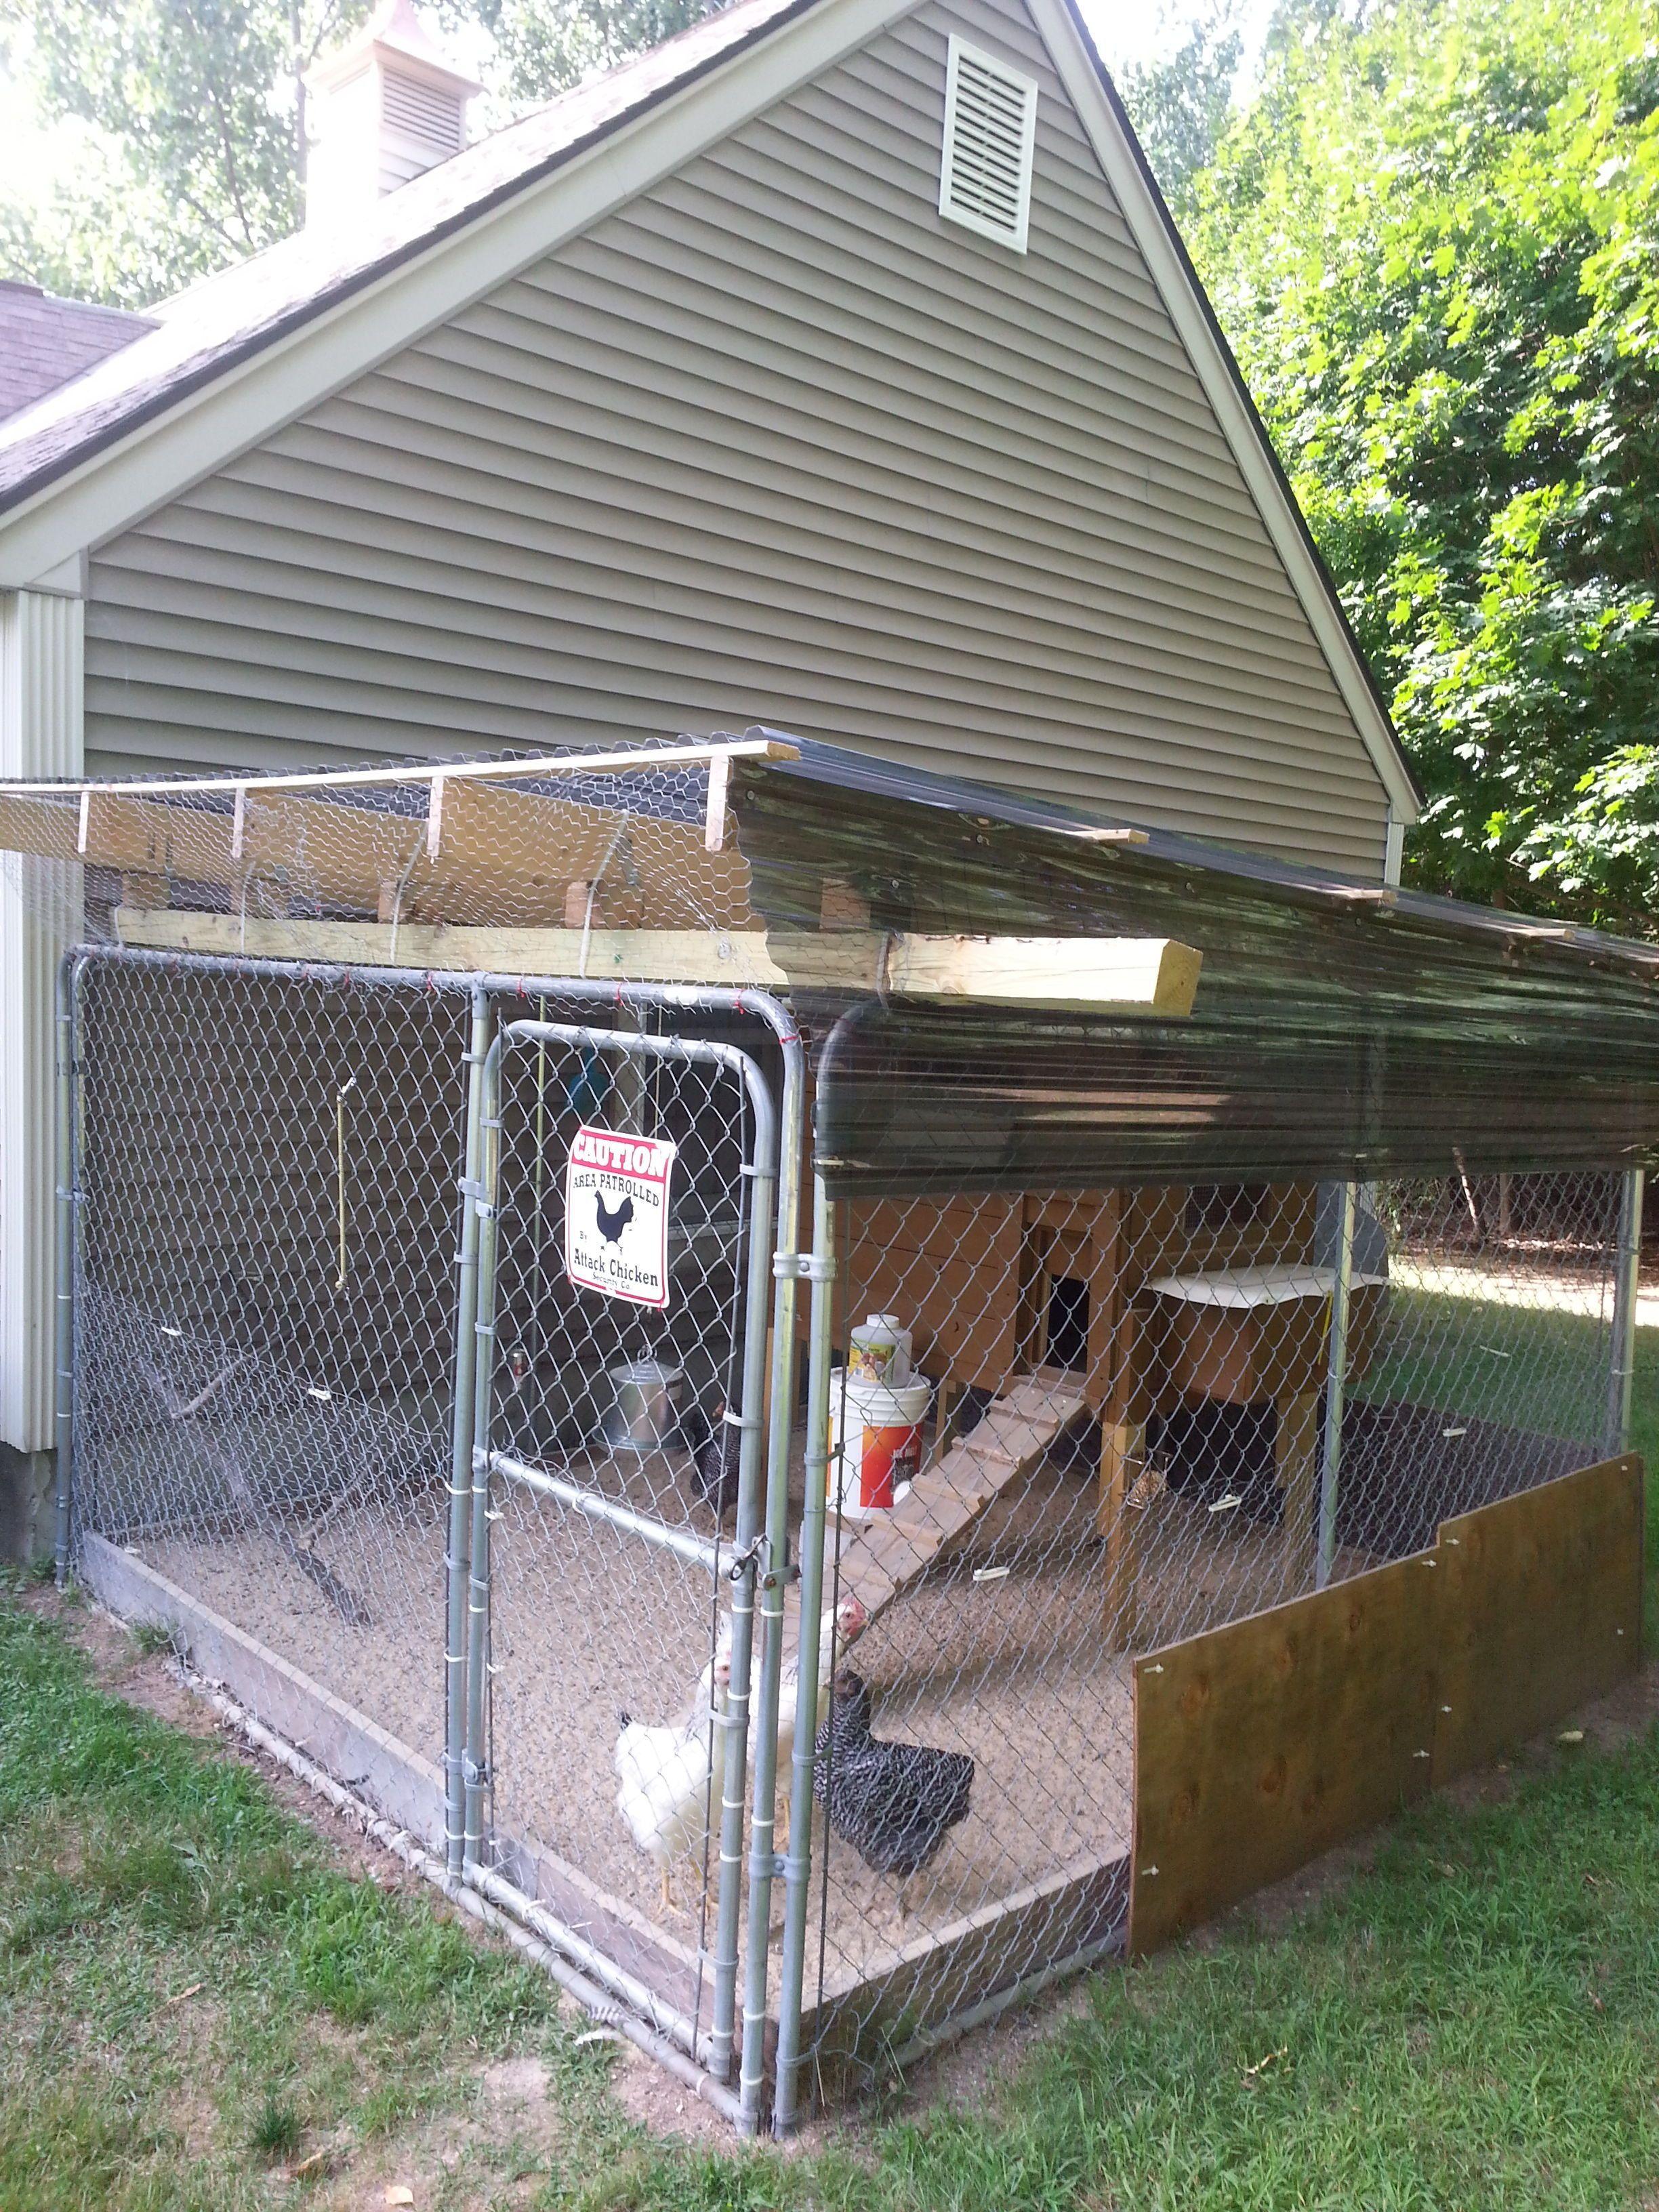 C61bc14e 20130807 170911 Jpeg 2448 3264 Dog Kennel Roof Diy Dog Kennel Chickens Backyard